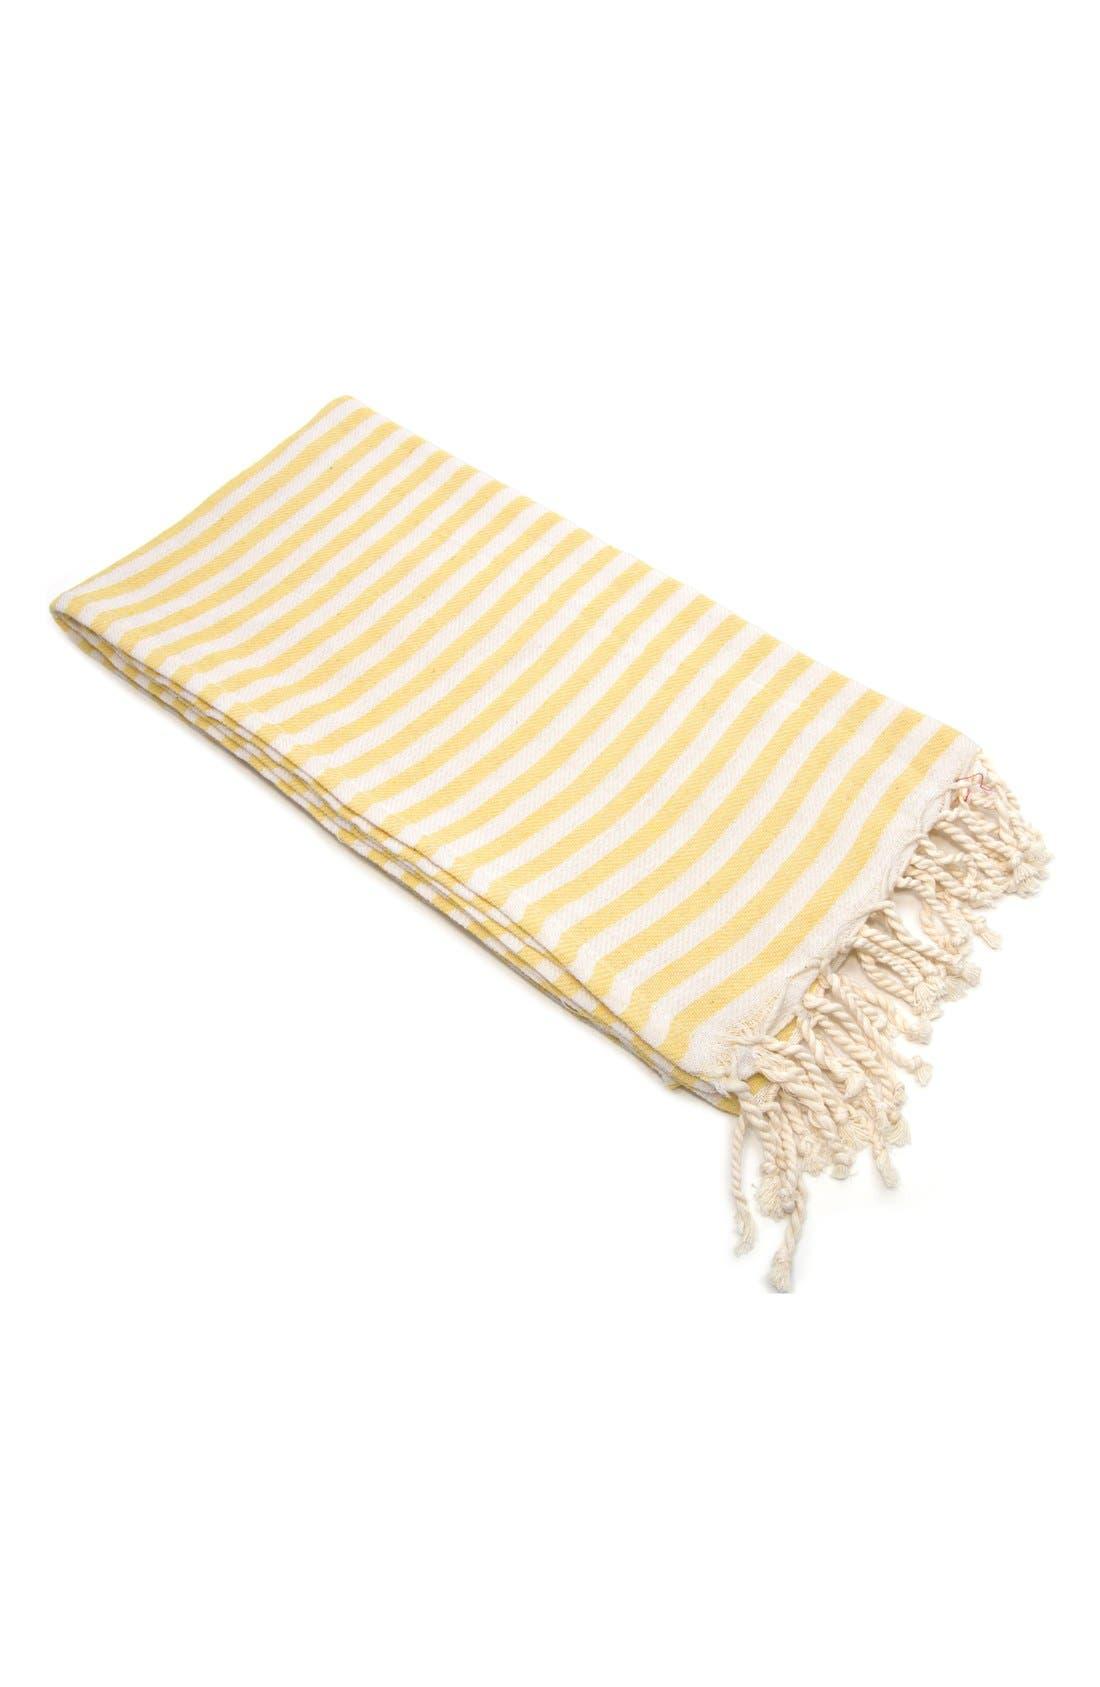 'Fun in the Sun' Turkish Pestemal Towel,                             Main thumbnail 1, color,                             Sunshine Yellow